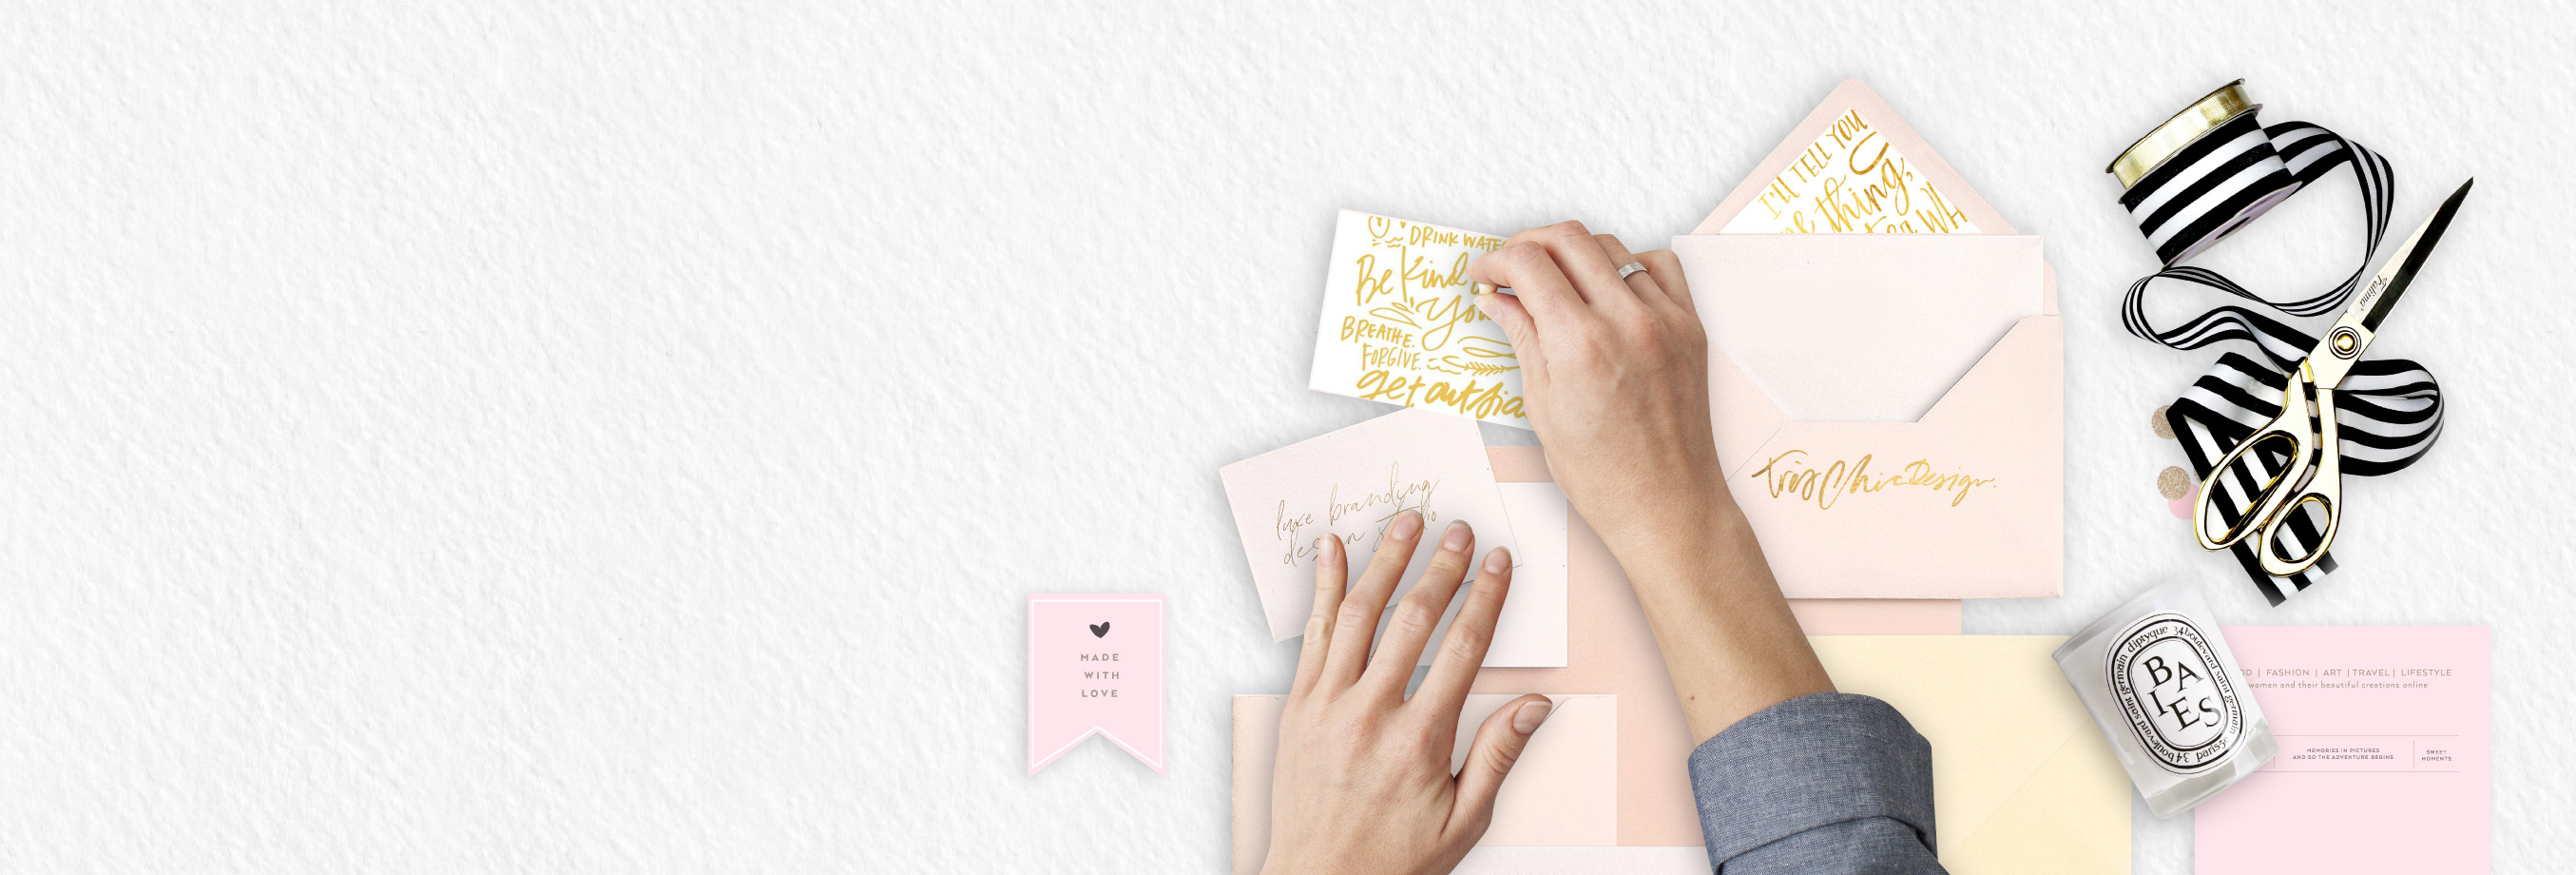 Tres Chic Studio Co | Luxe Premade Branding + Design